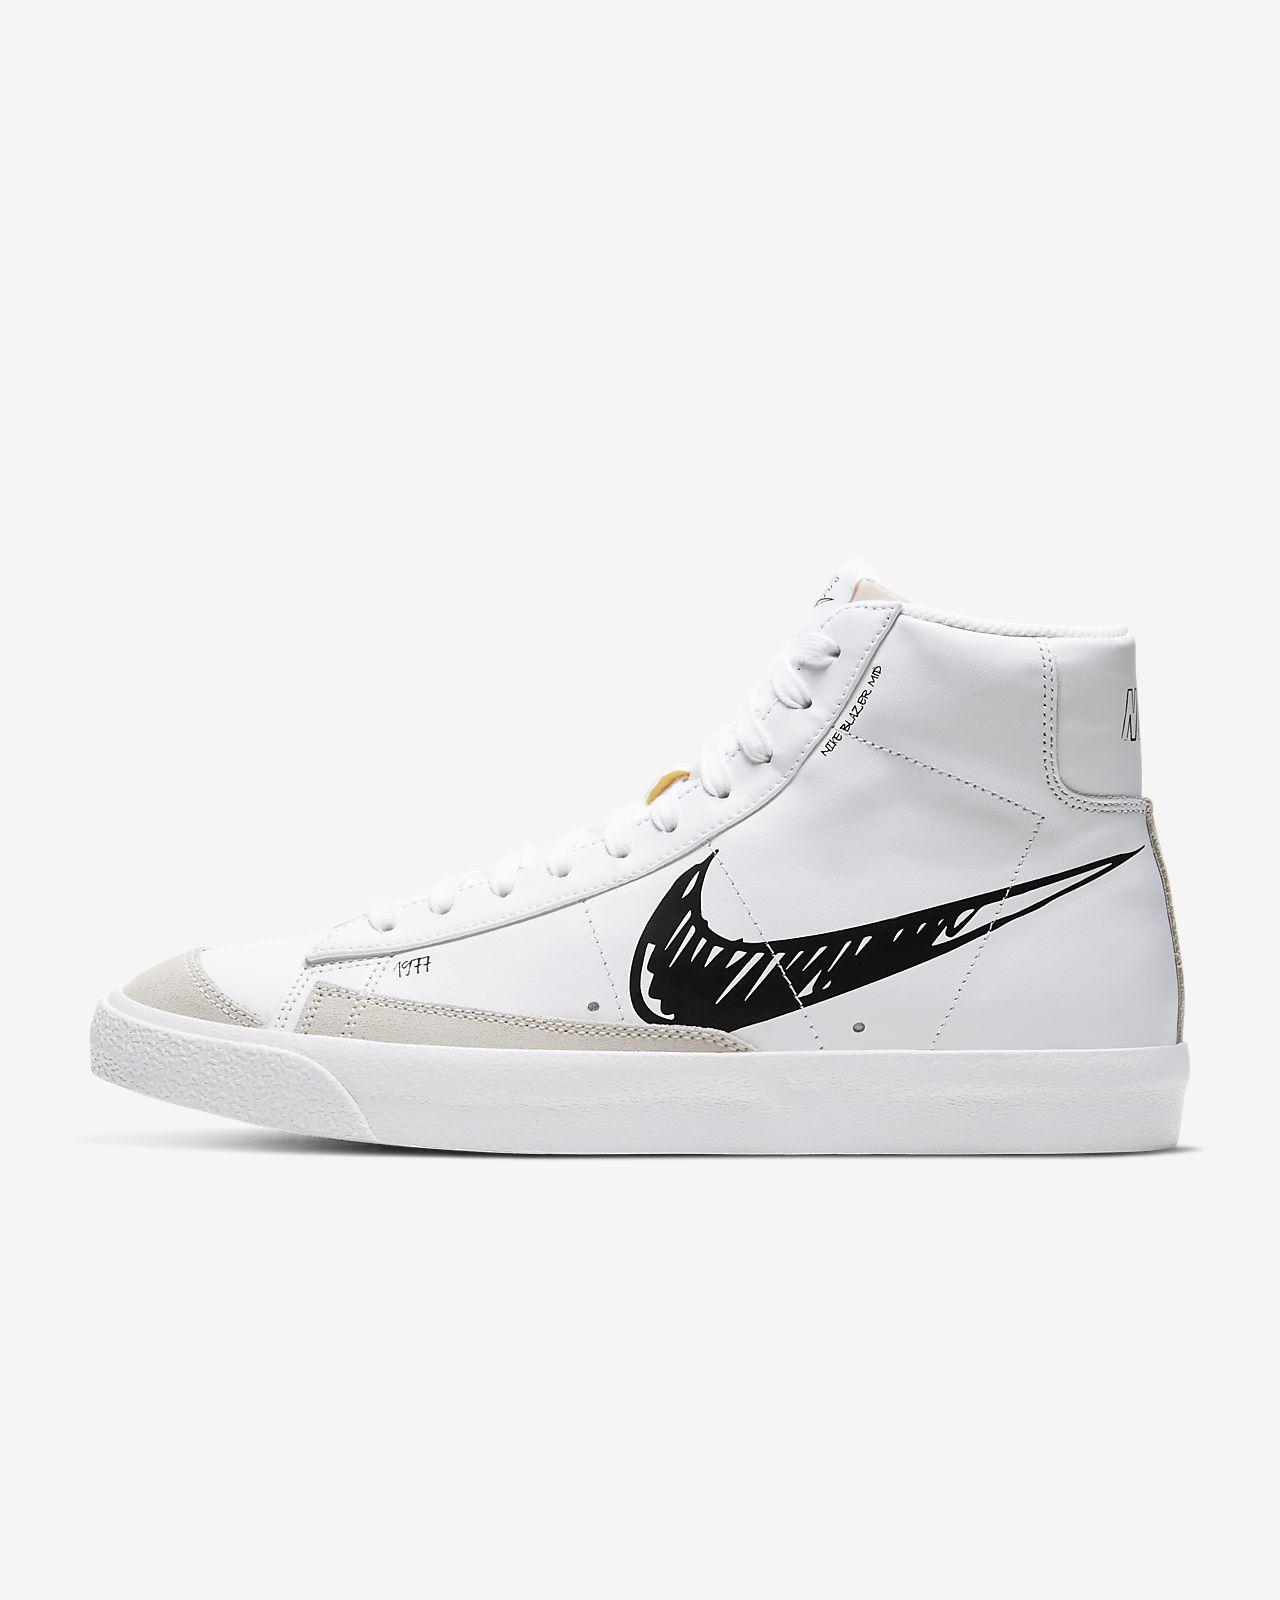 Nike Blazer Mid Vintage '77 Schoen